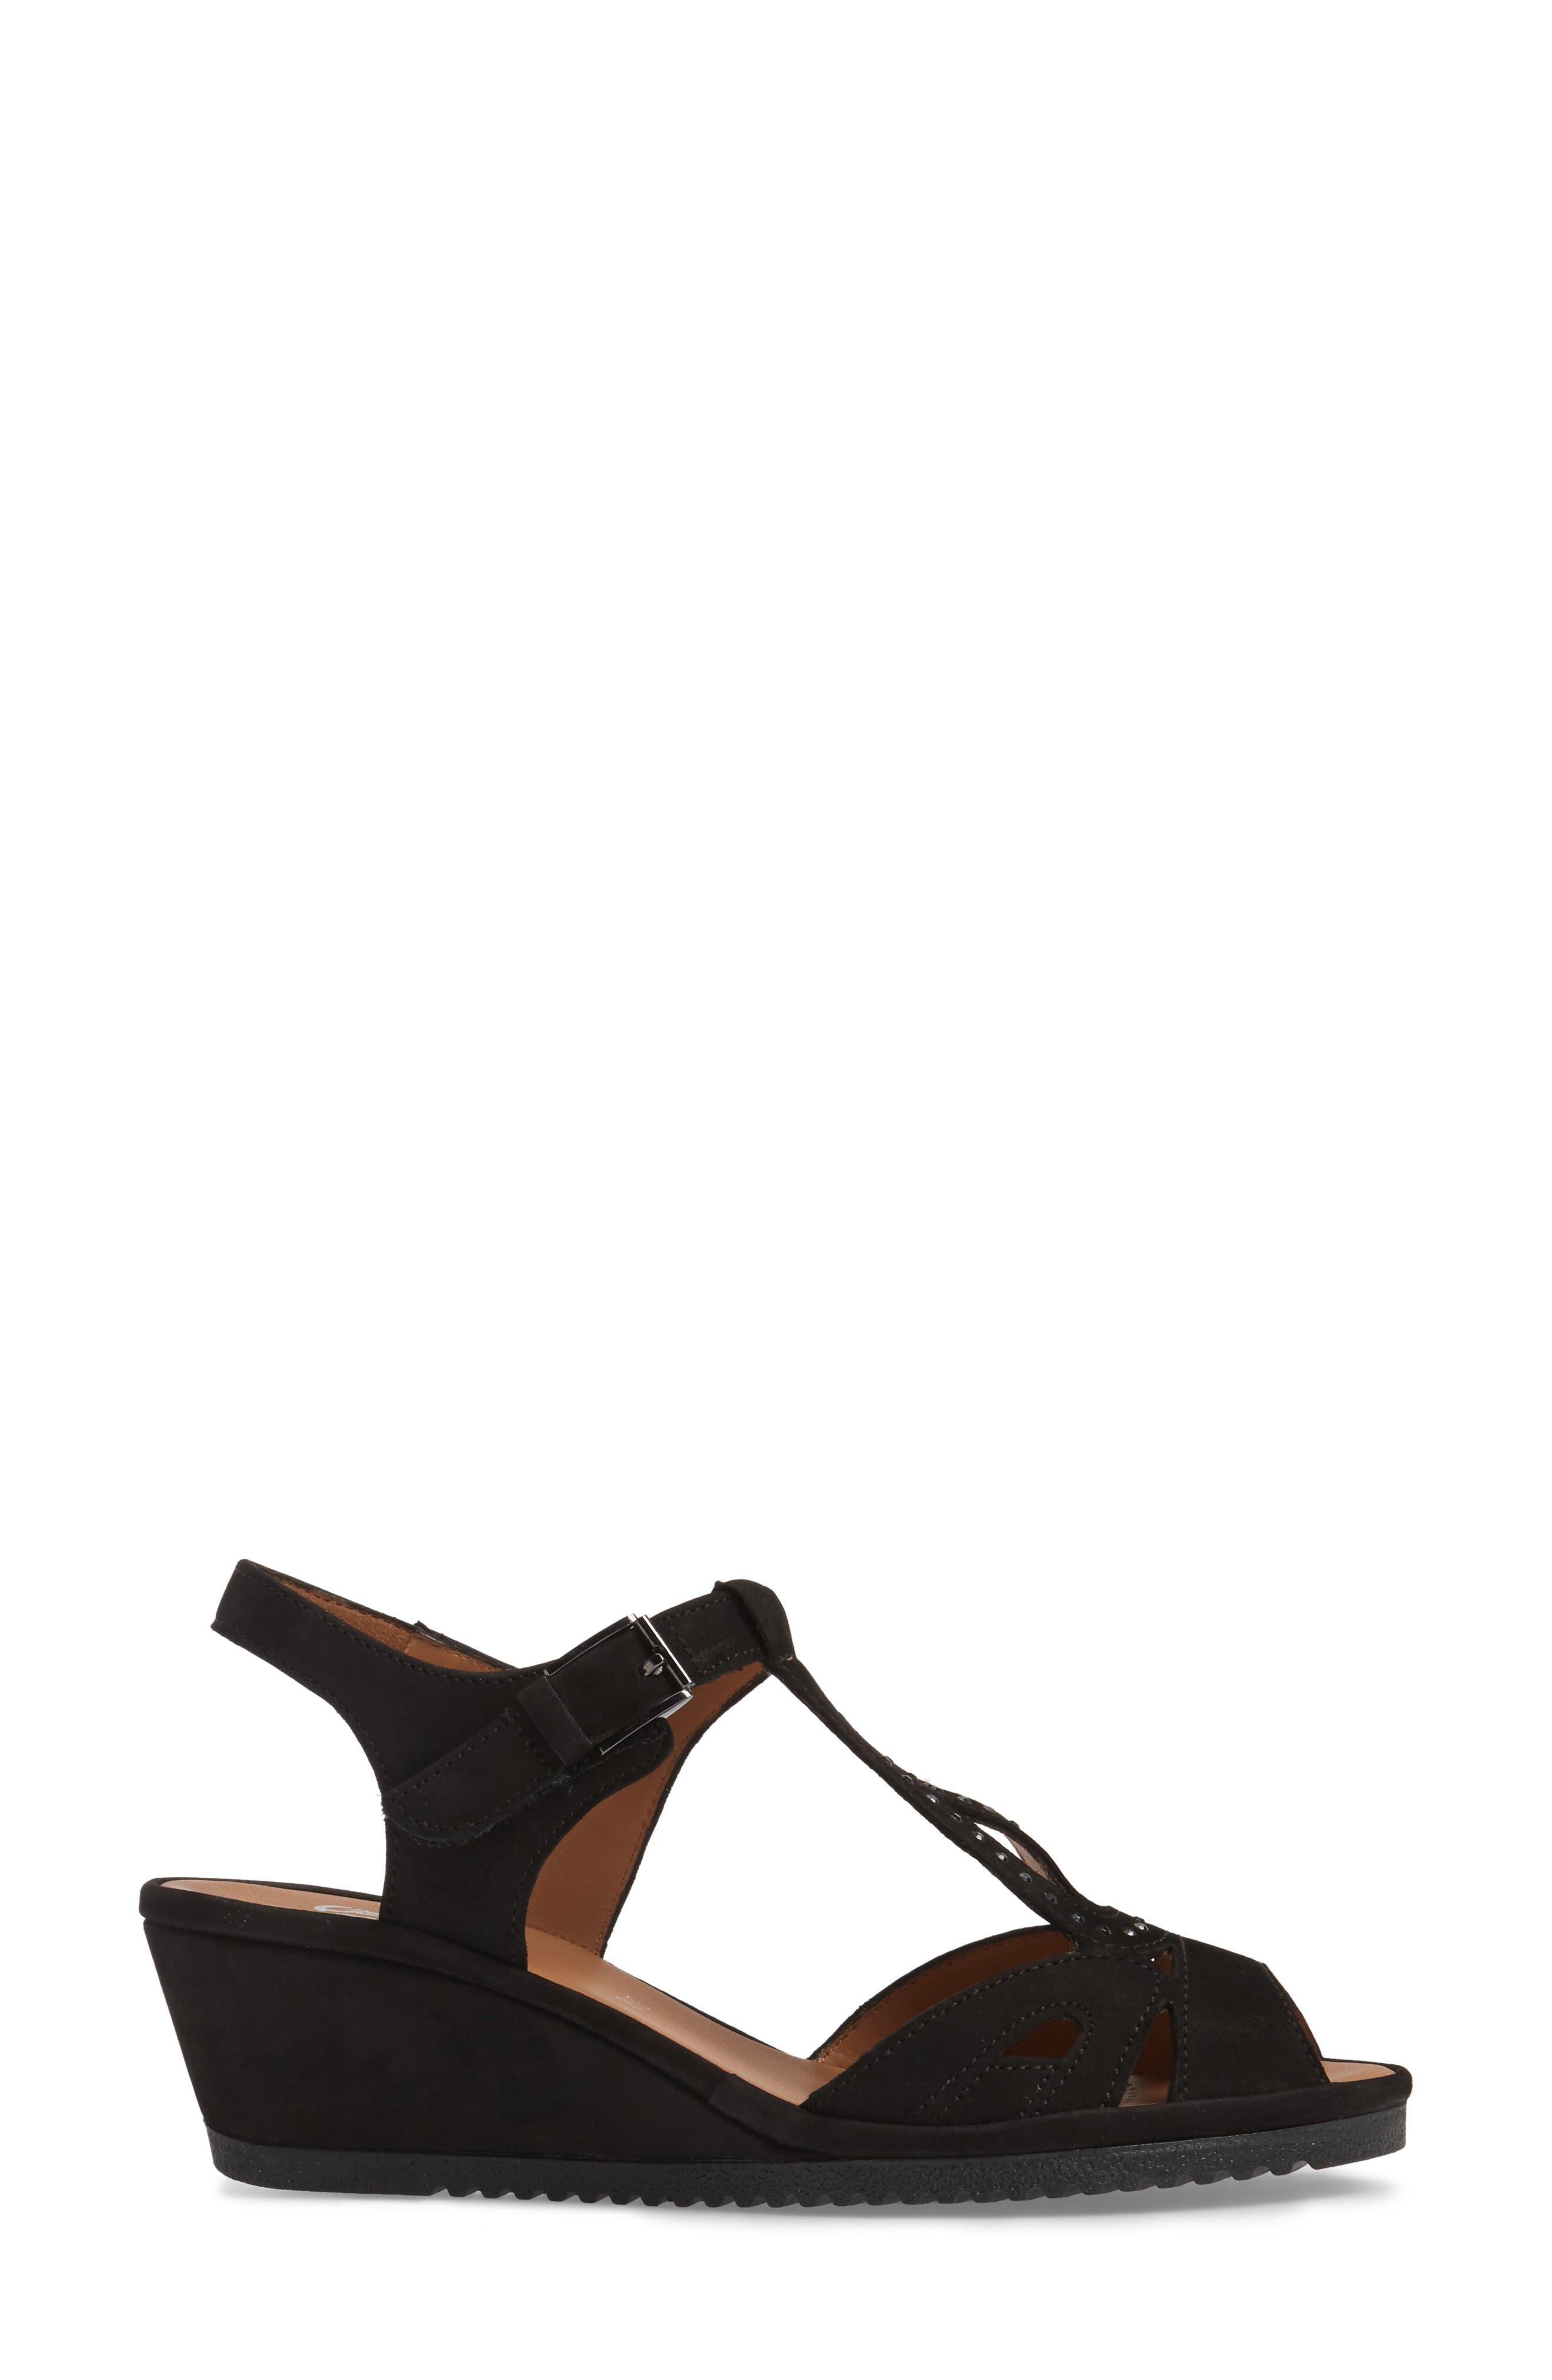 Wedge Sandal,                             Alternate thumbnail 3, color,                             Black